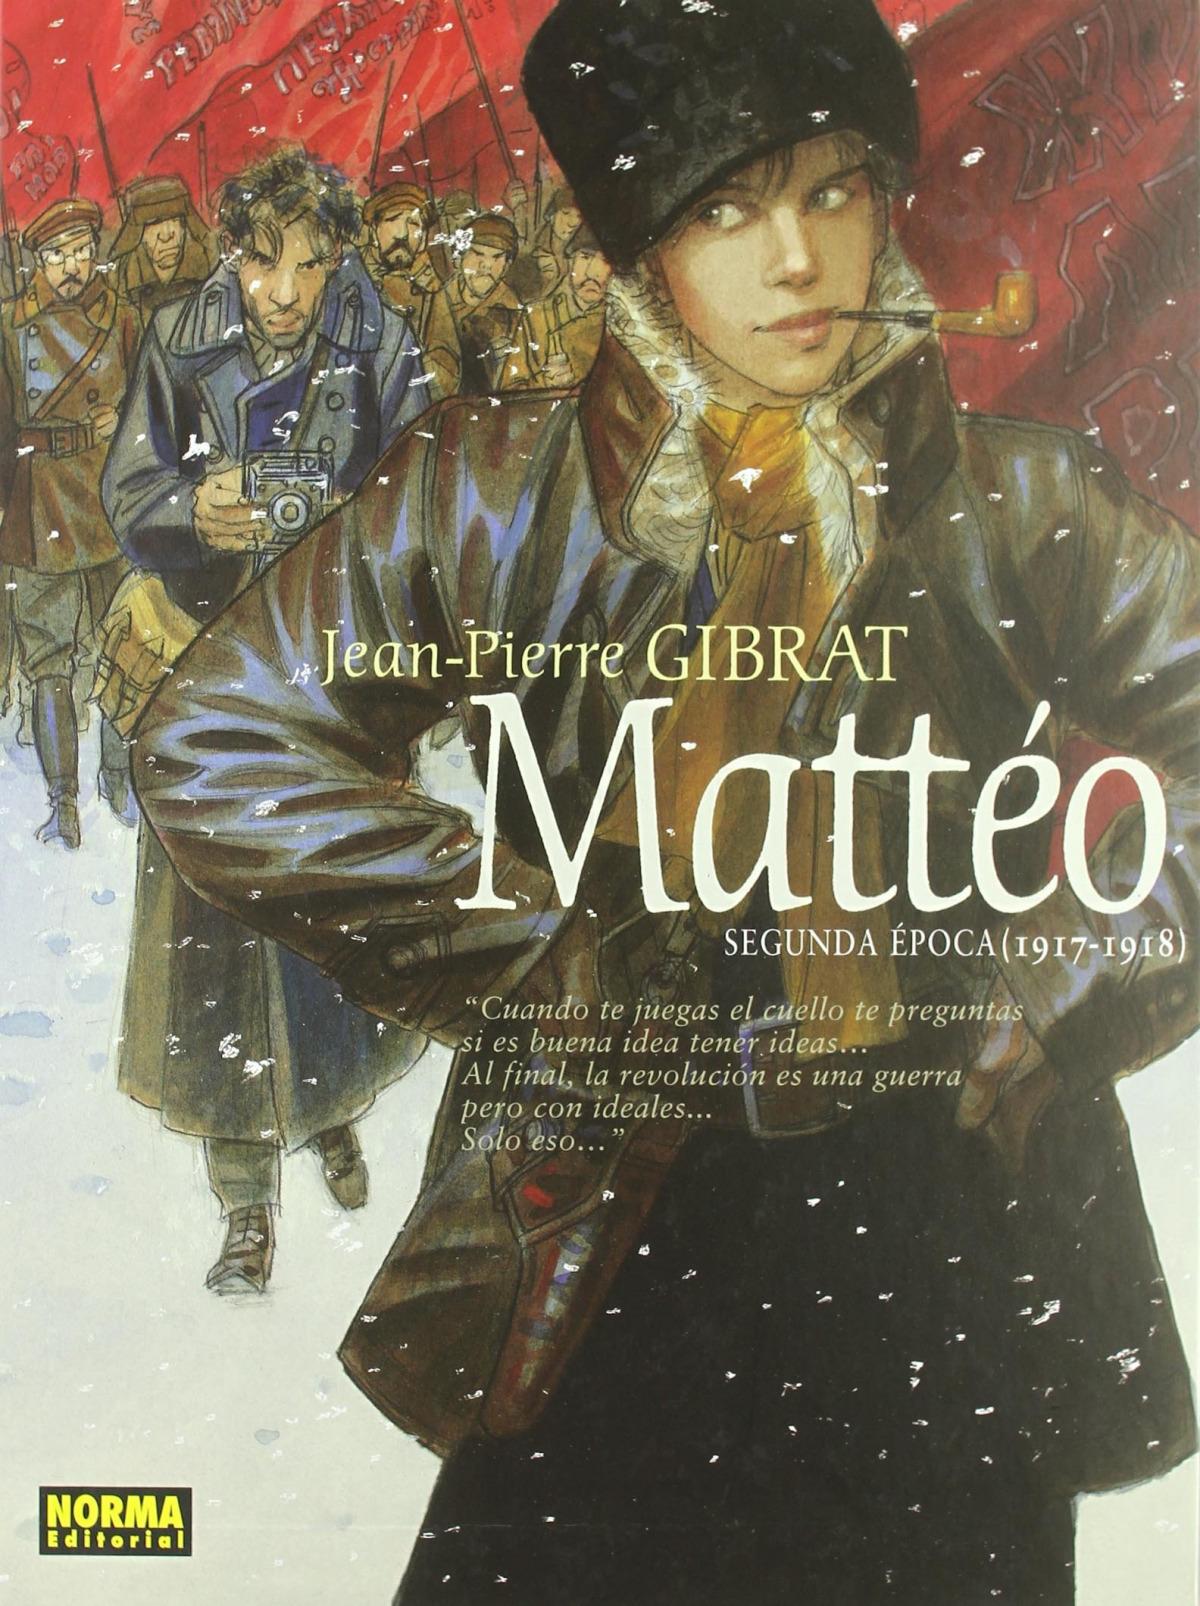 Matteo, 2ª Epoca 1917-1918